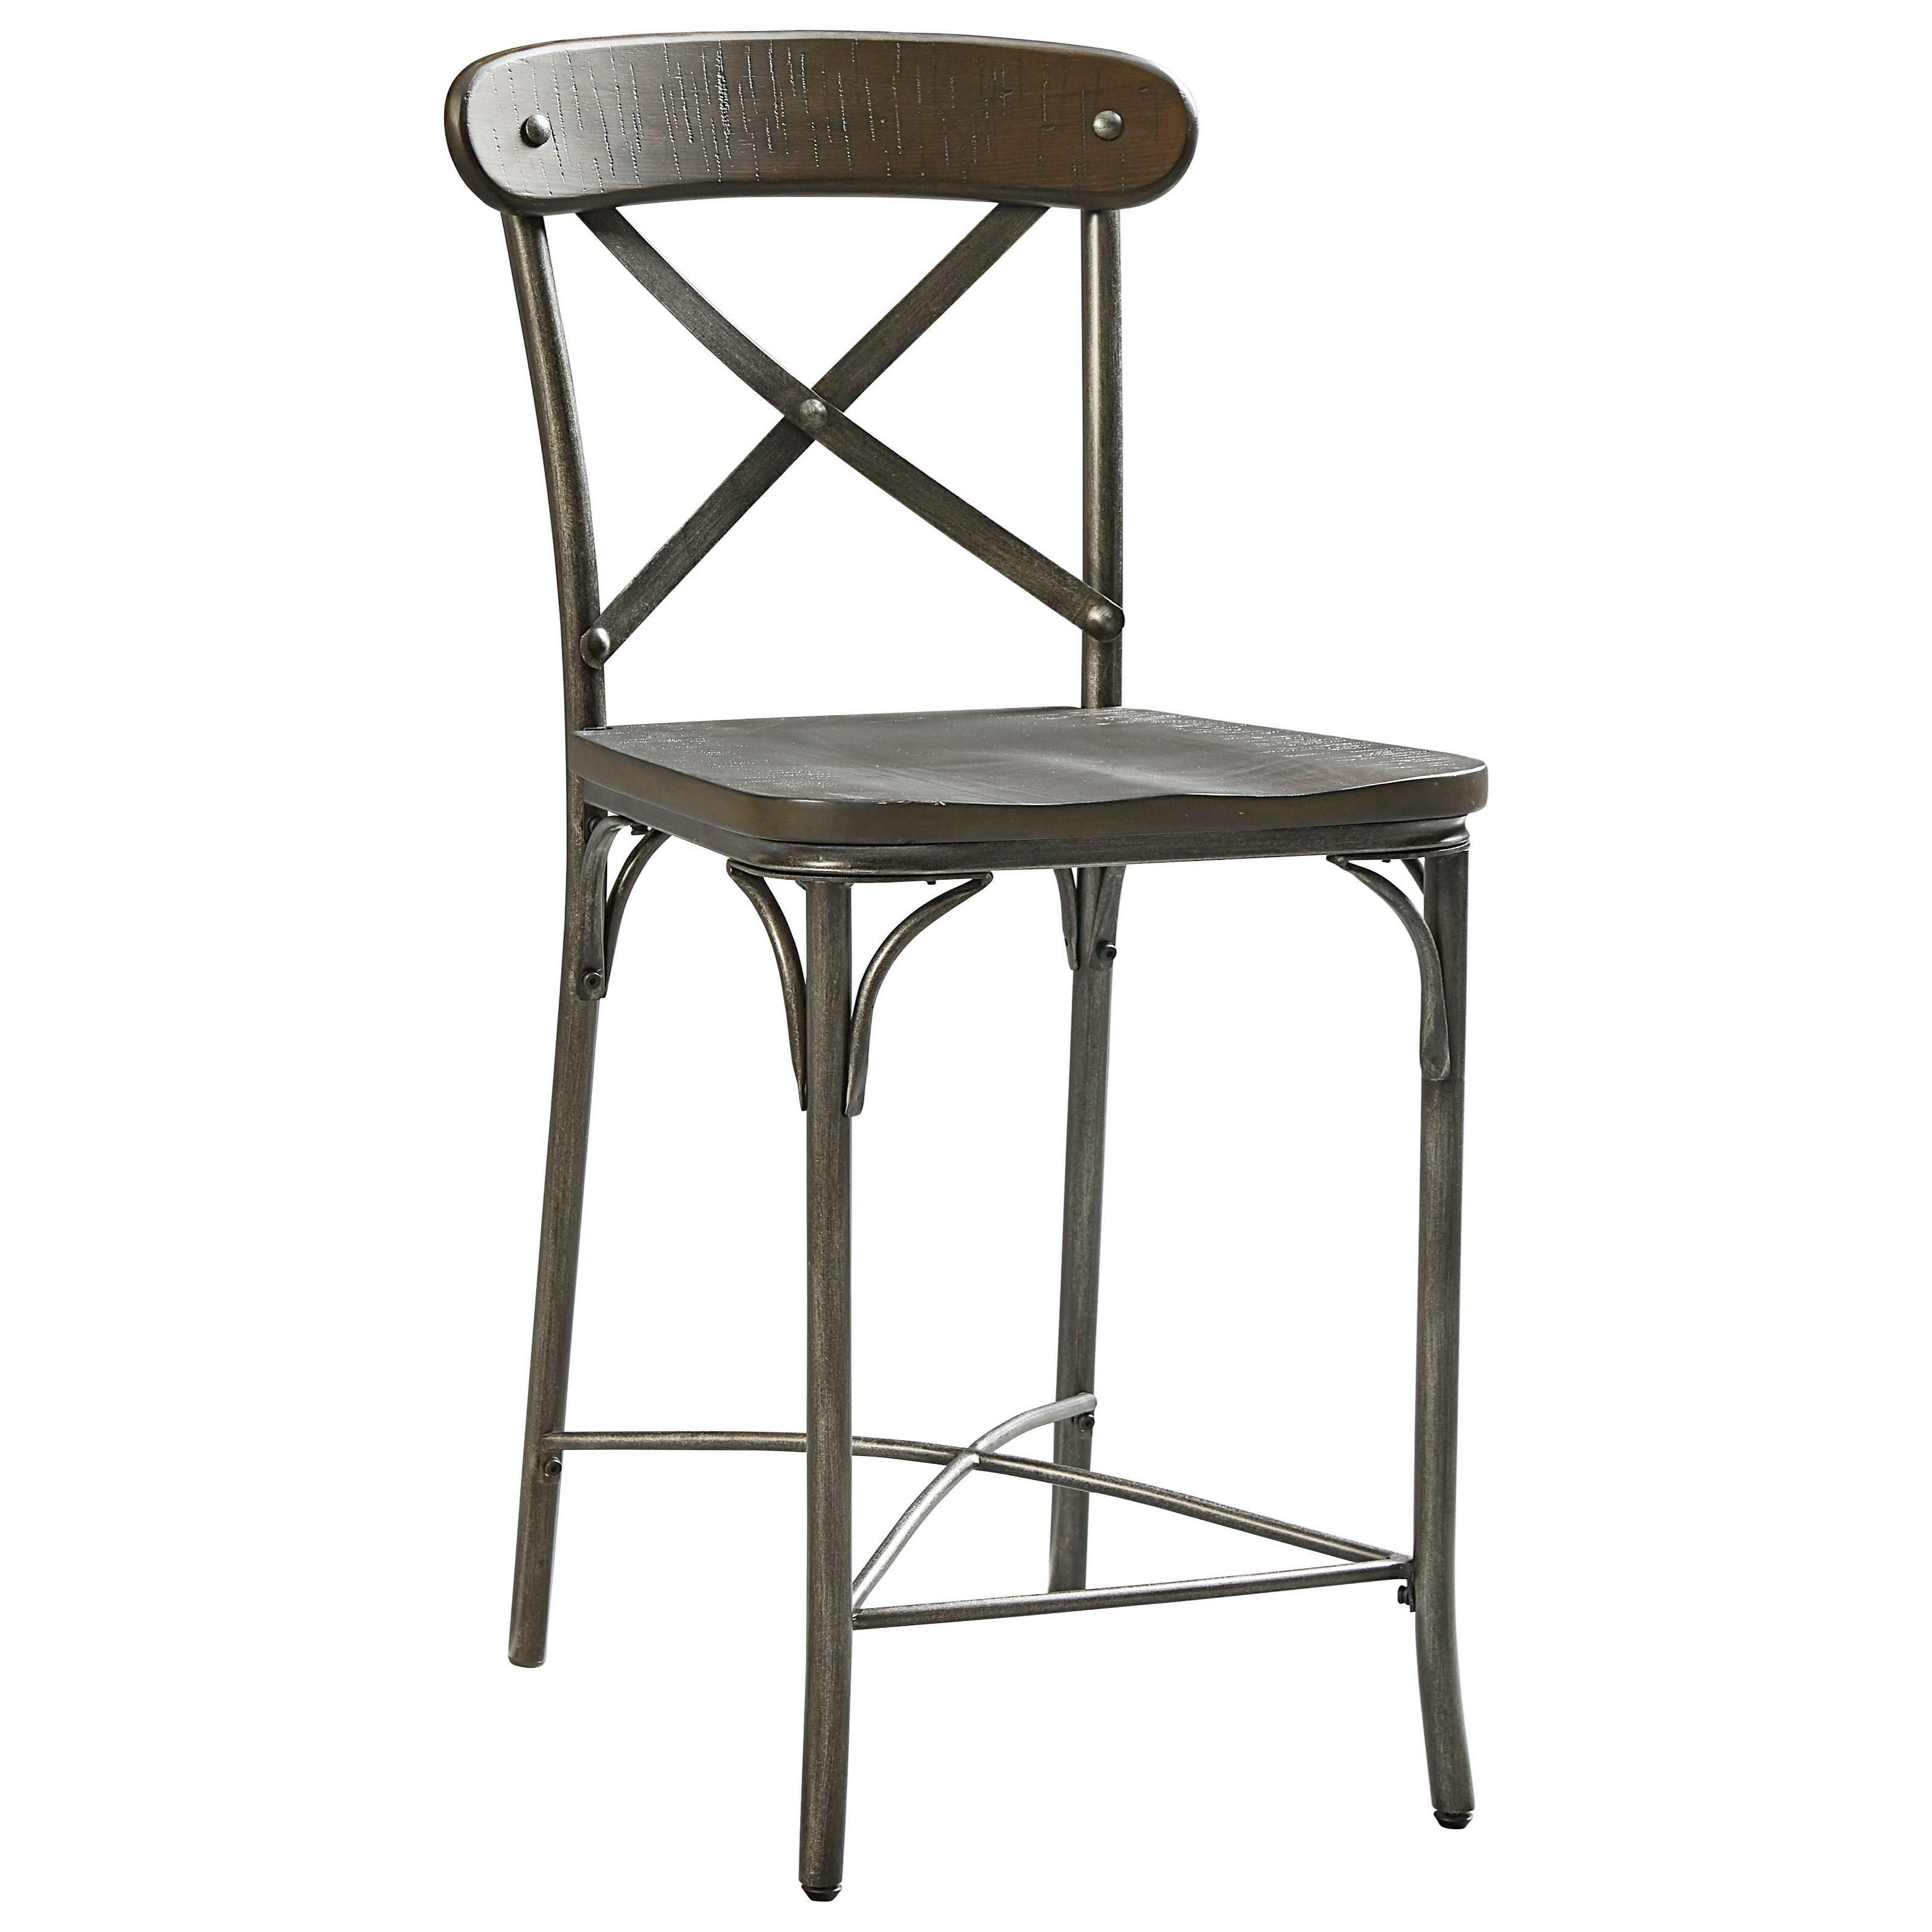 Standard Furniture Montvale Industrial Metal X Back Stool  : products2Fstandardfurniture2Fcolor2Fmontvale 116889781616894 b1 from www.olindes.com size 3200 x 3200 jpeg 493kB